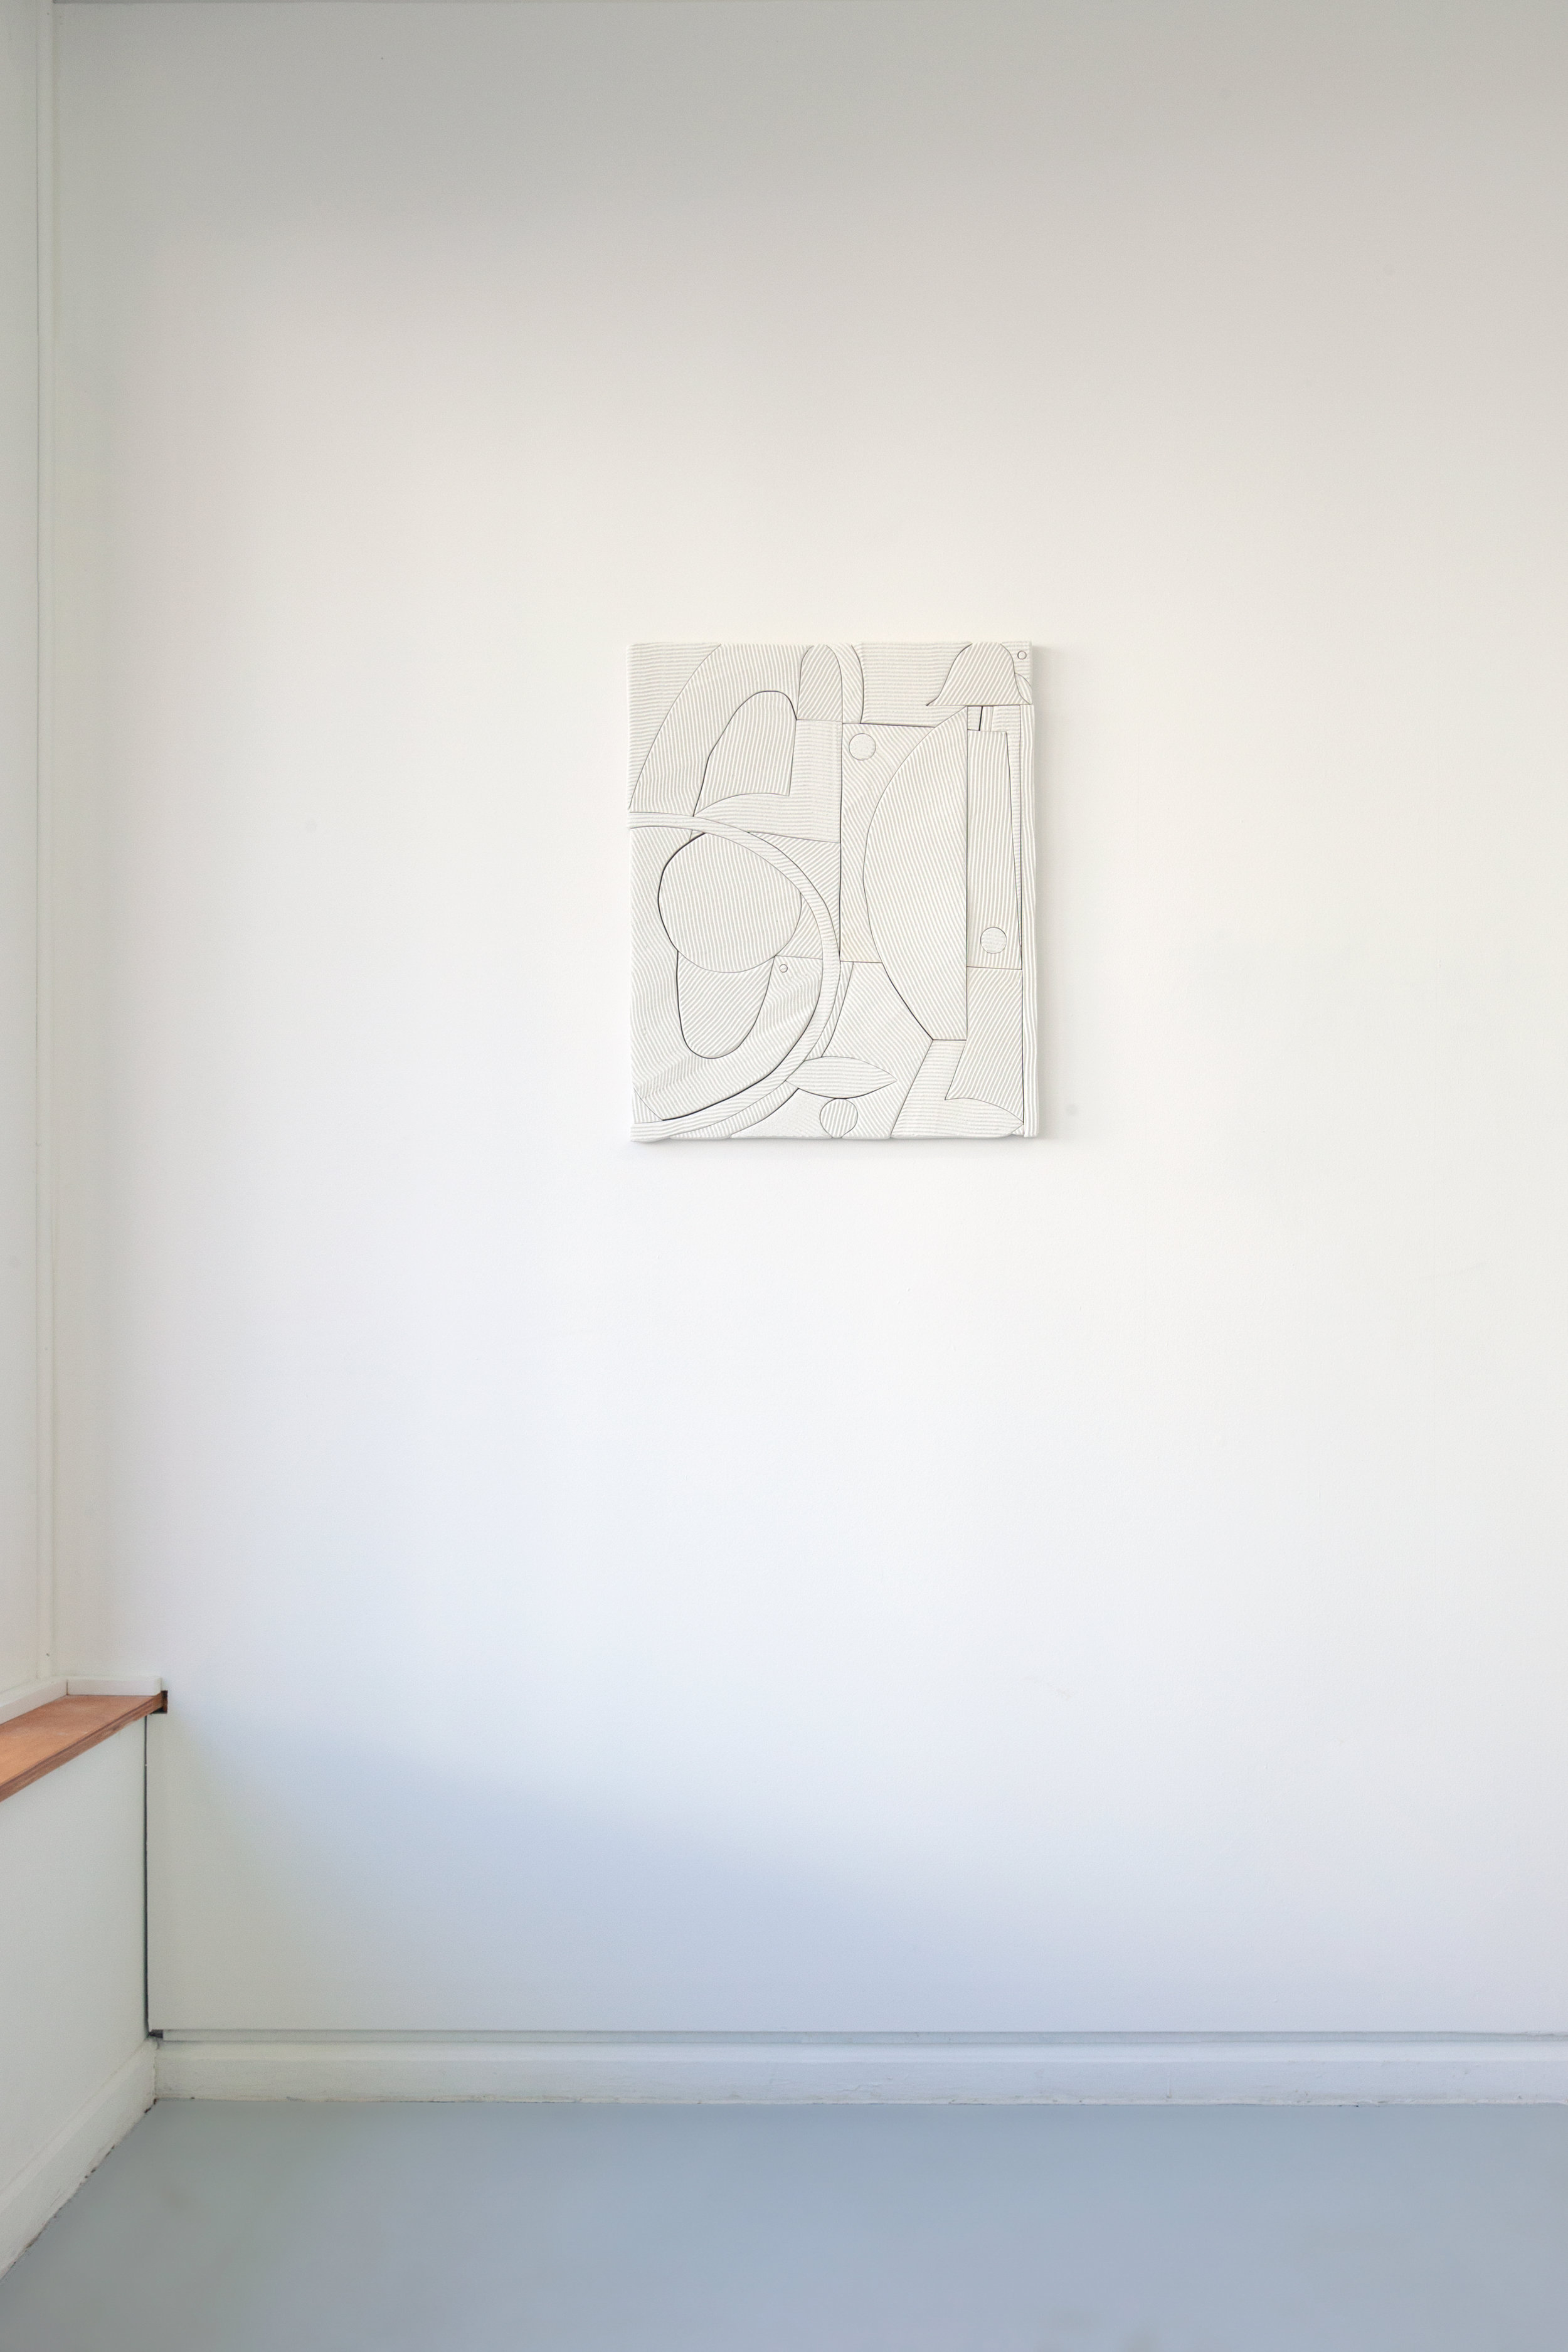 Elizabeth_Atterbury-Night_Comes_In-Installation_View_019.jpg